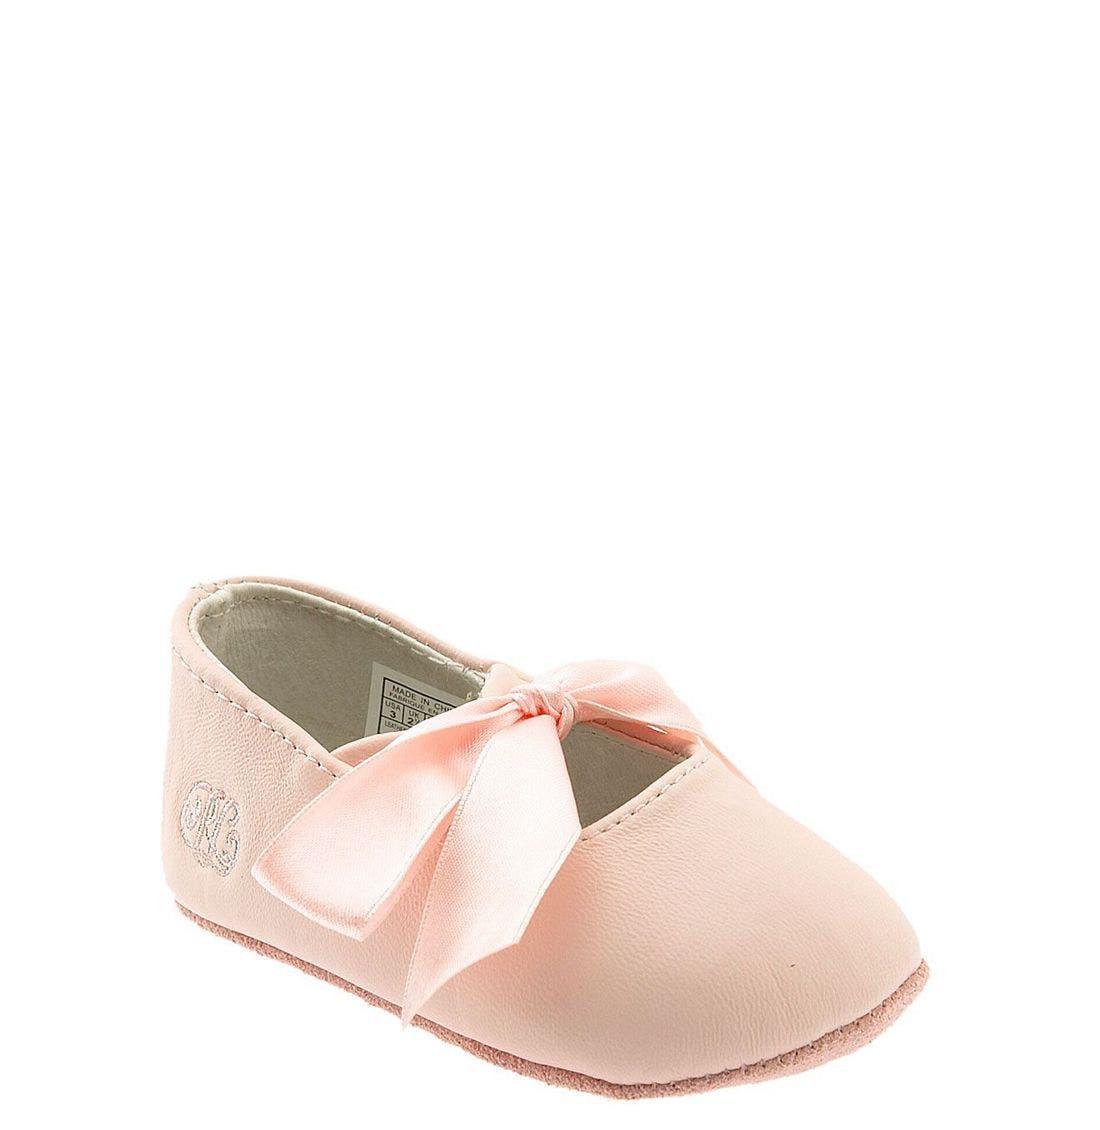 Main Image - Ralph Lauren Layette 'Briley' Shoe (Baby)